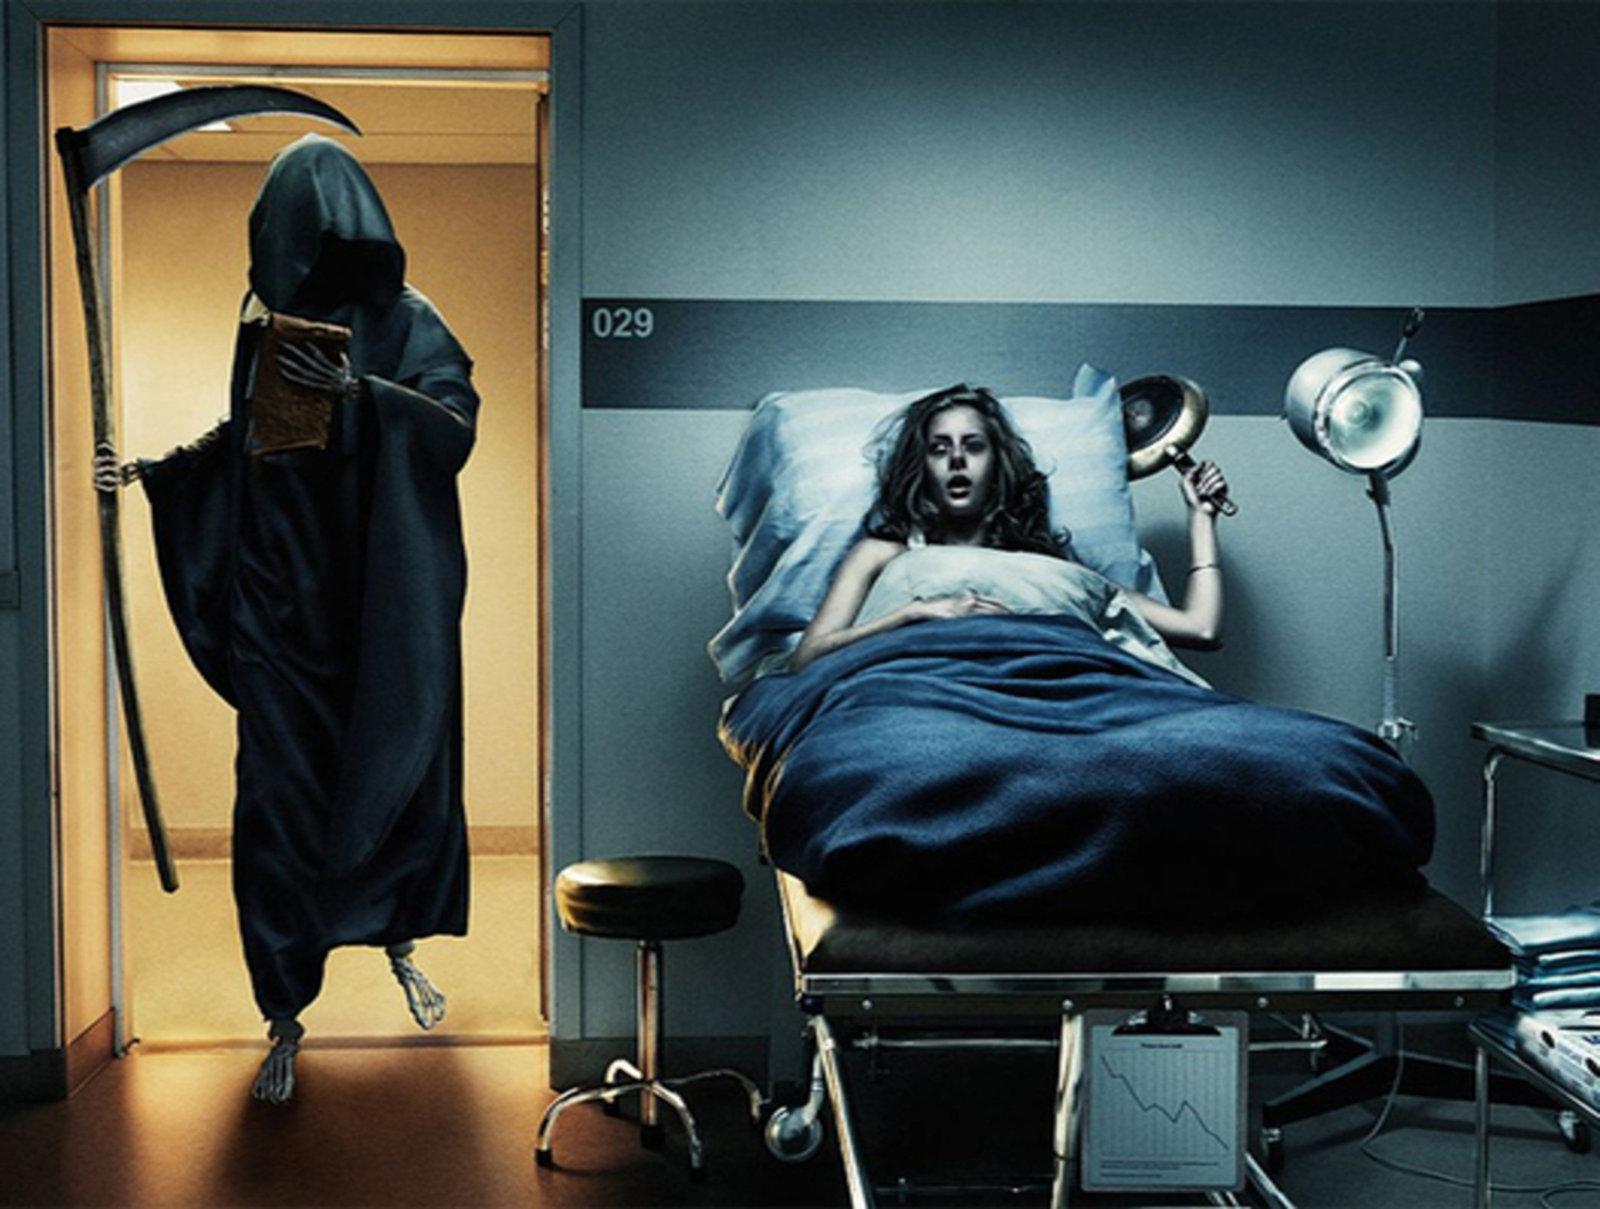 Drawn grim reaper grem  reaper and the images